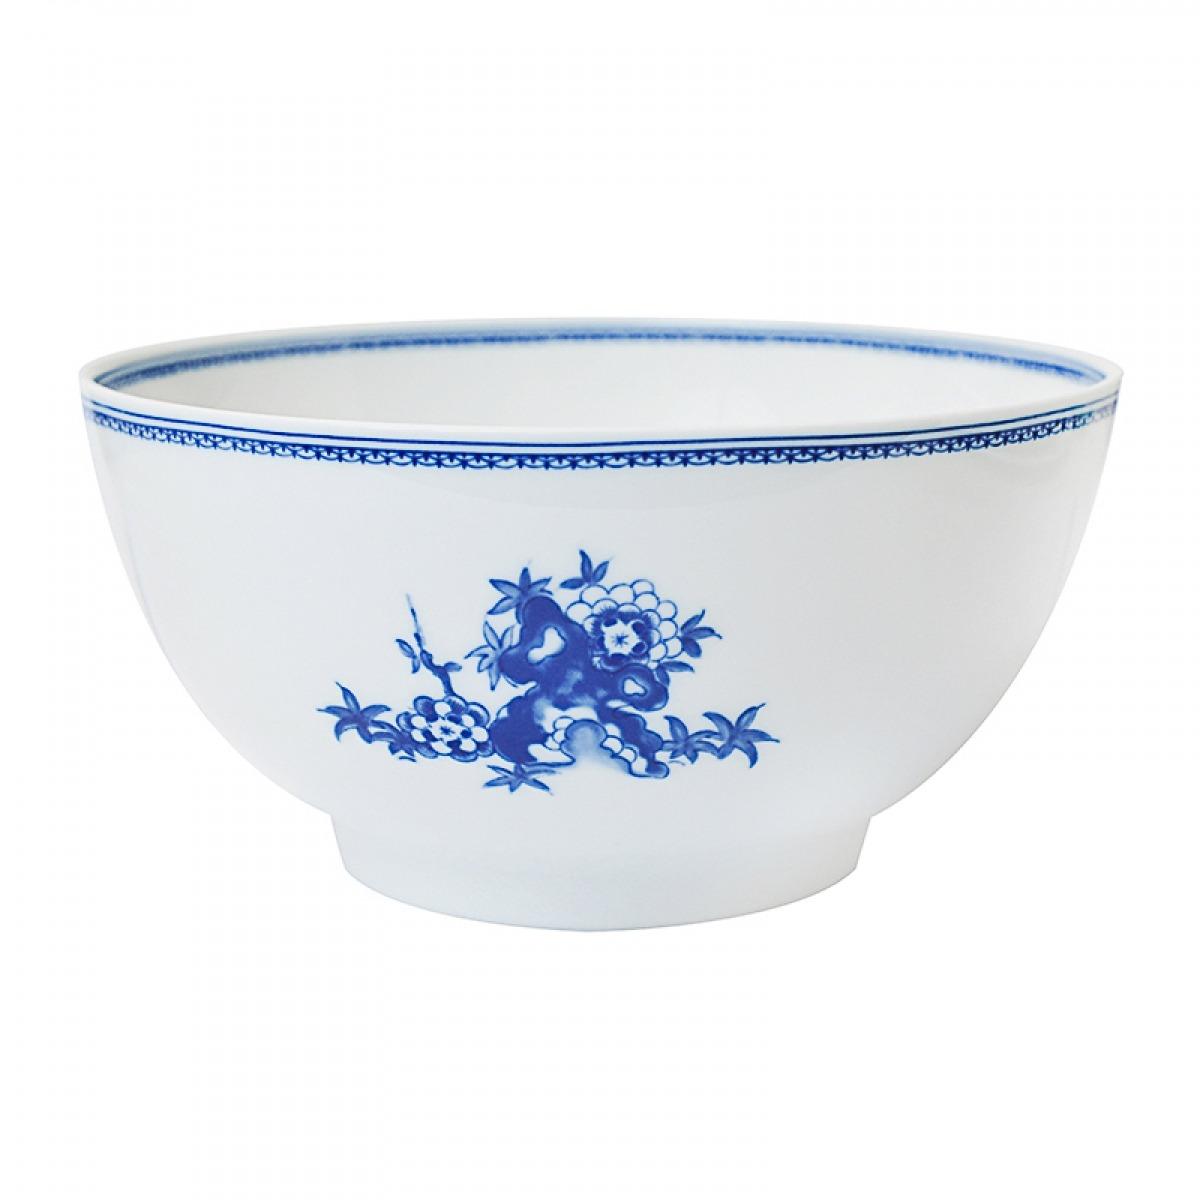 Saladeira Blue Macau Matisse Casa Vista Alegre G